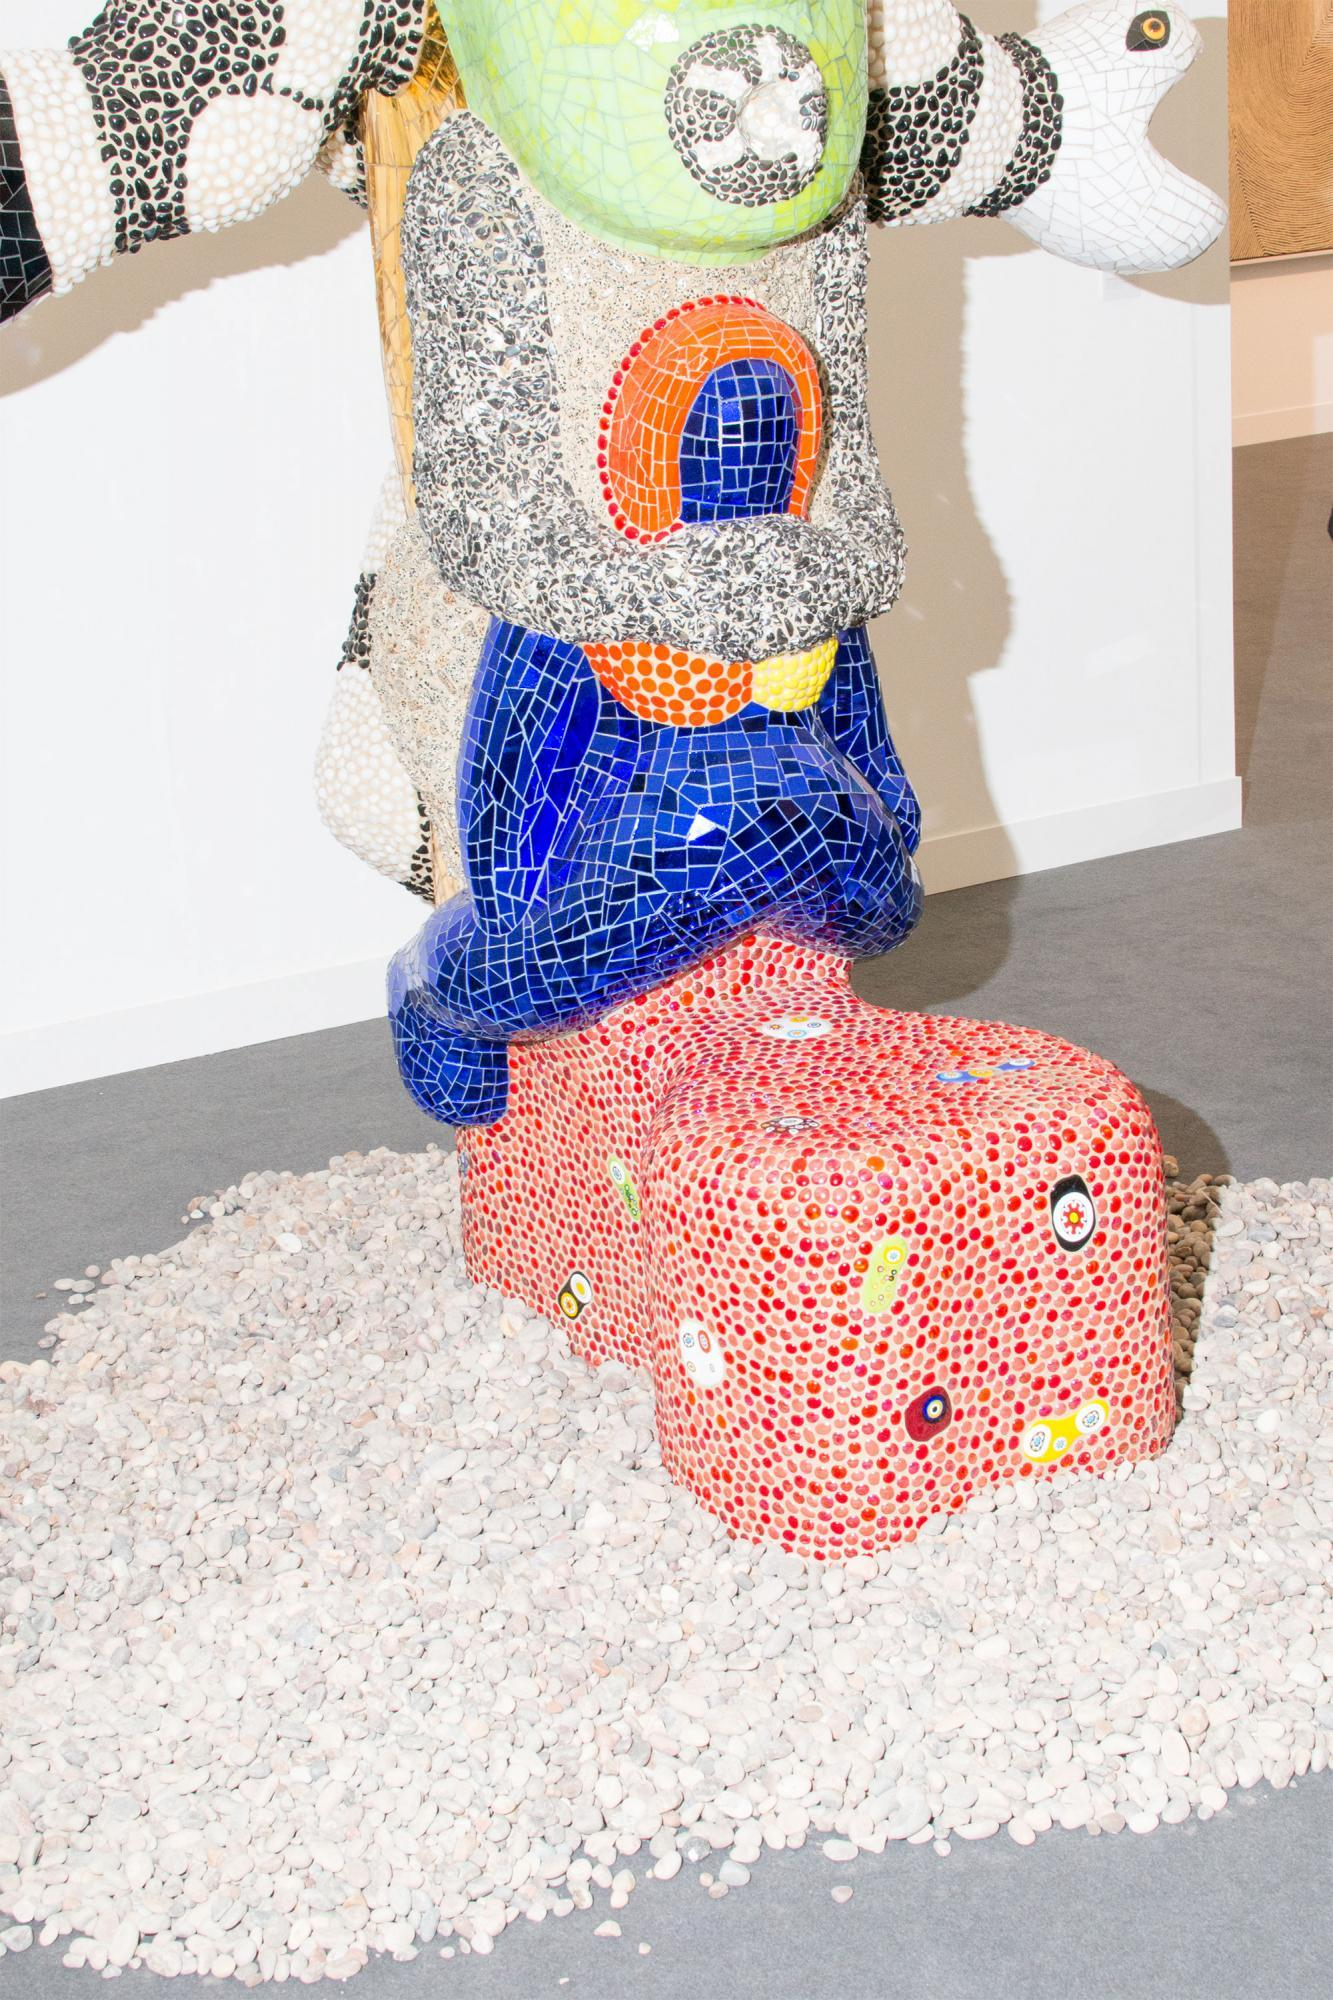 Niki de Saint Phalle at Salon 94